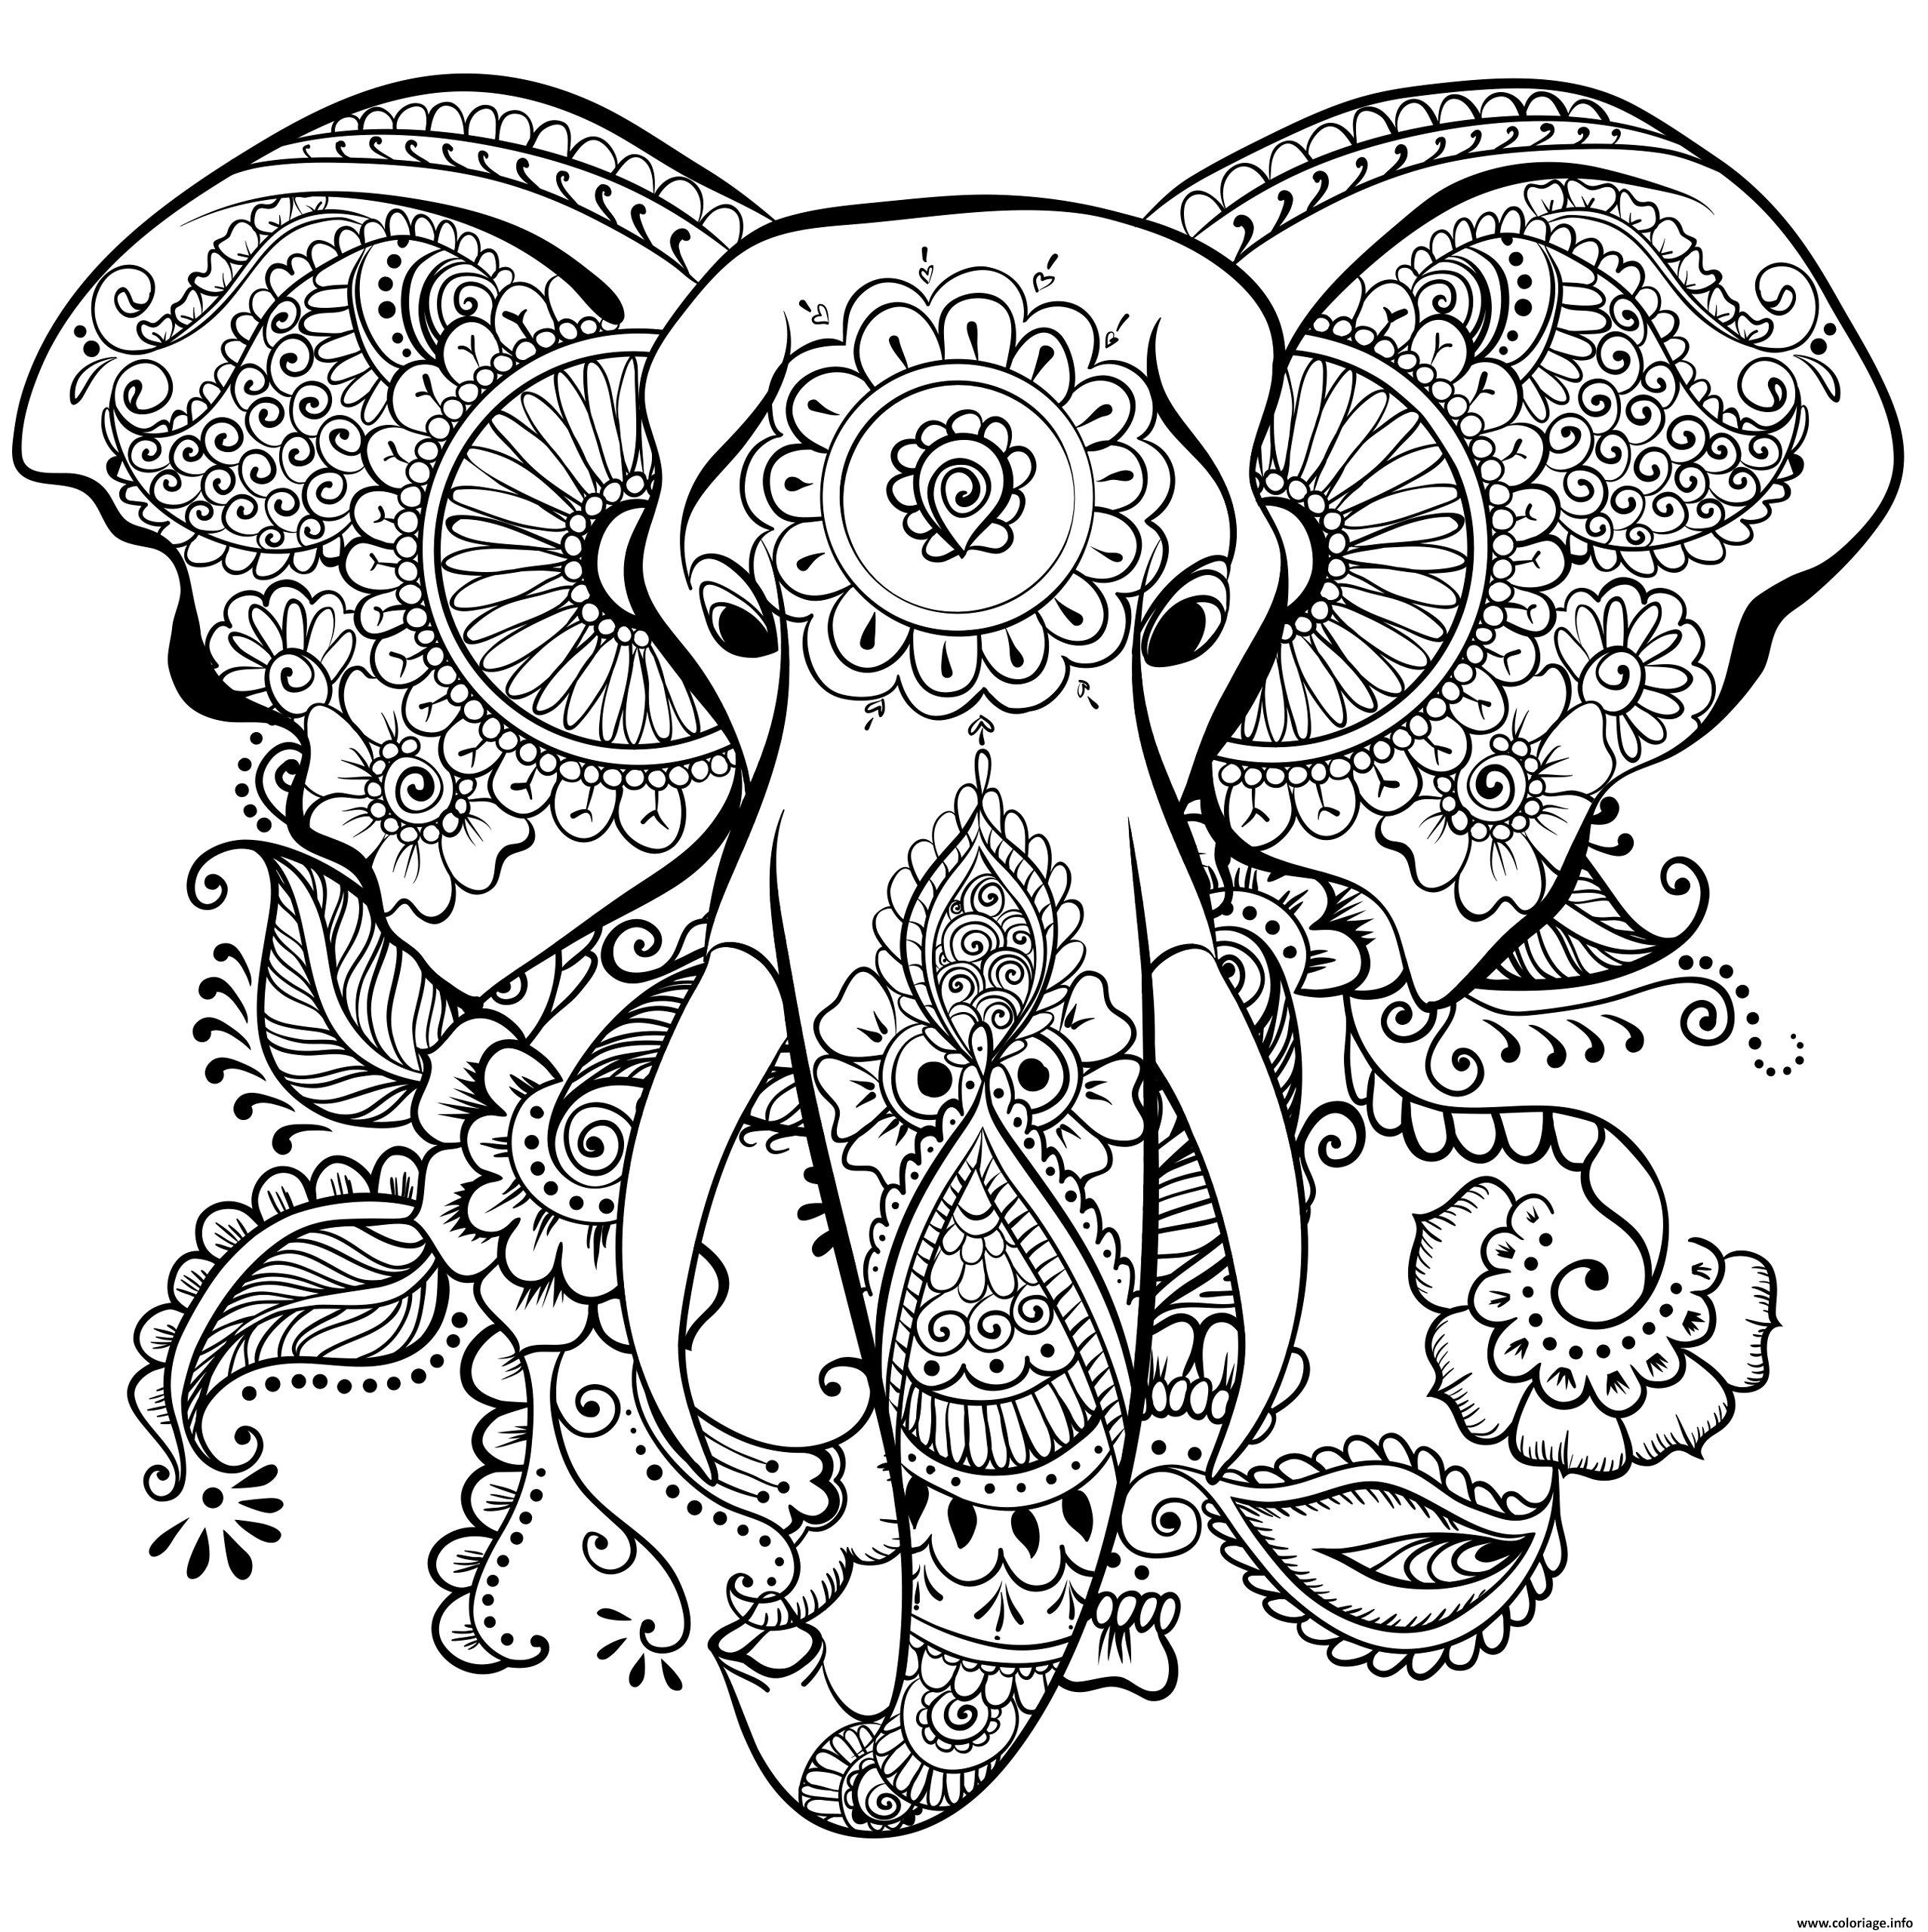 Coloriage Elephant Pour Adulte.Coloriage Elephant Anti Stress Adulte Dessin